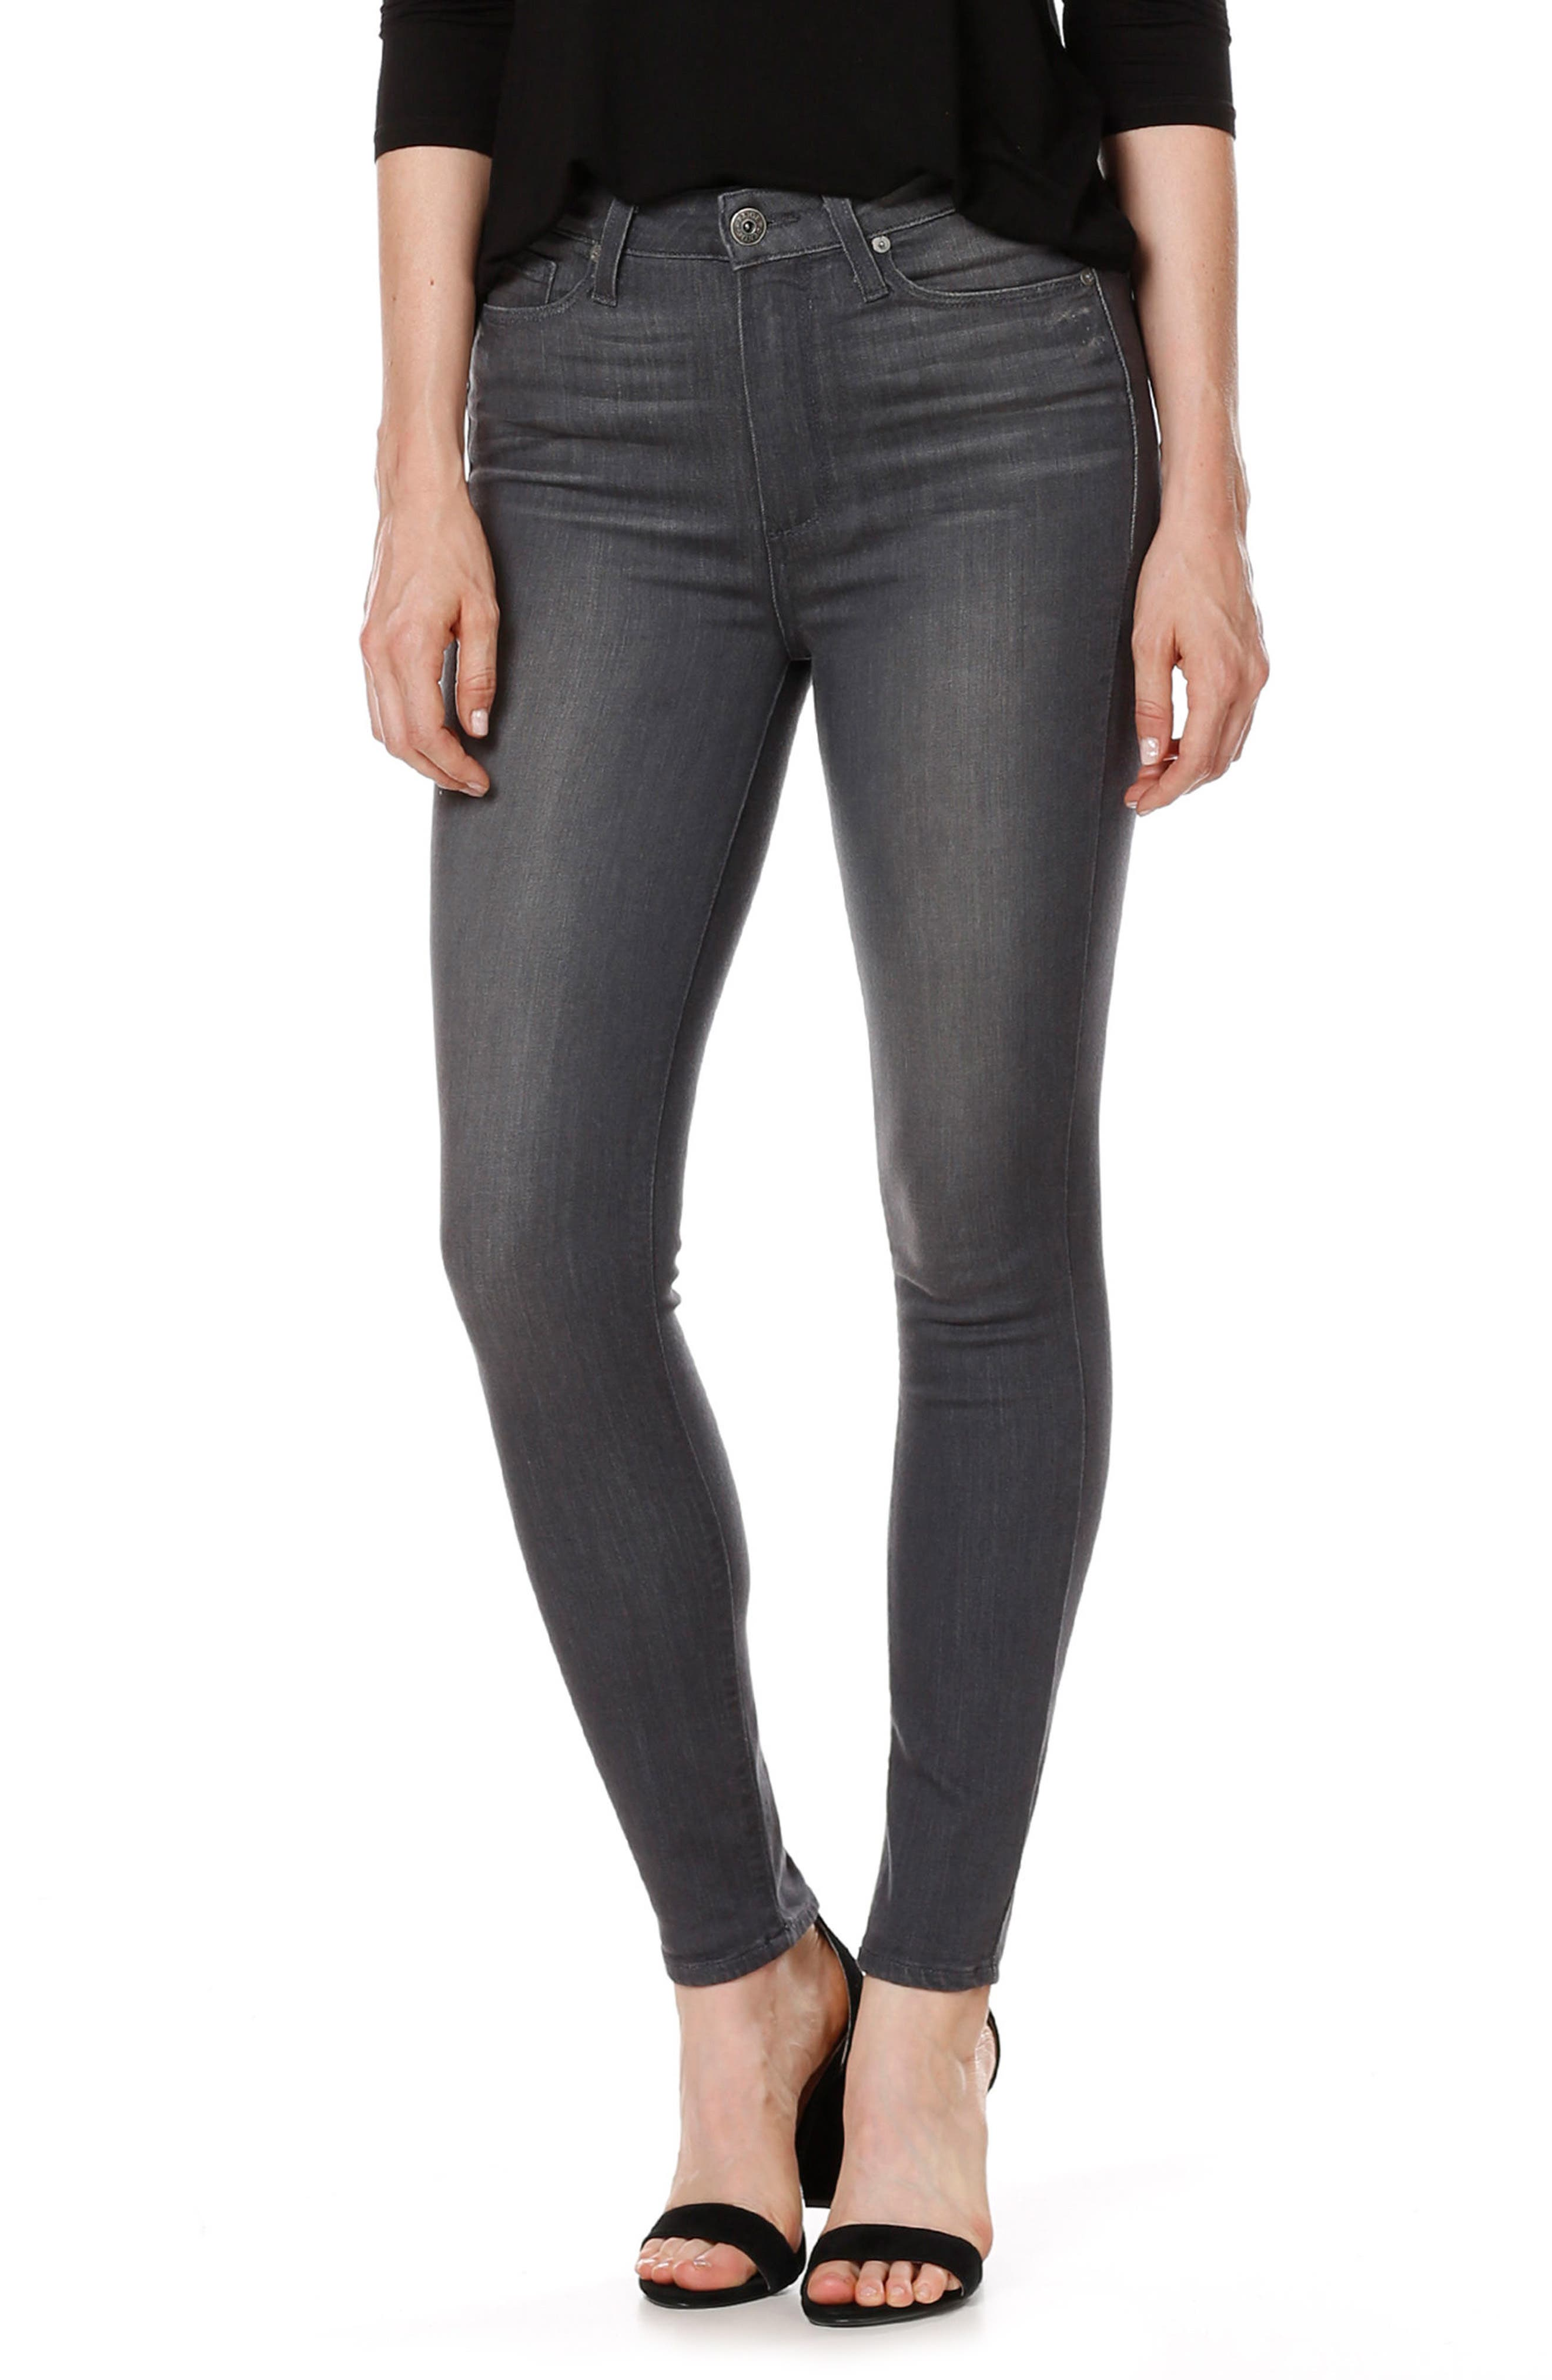 Transcend - Margot High Waist Ankle Ultra Skinny Jeans,                             Alternate thumbnail 3, color,                             Summit Grey